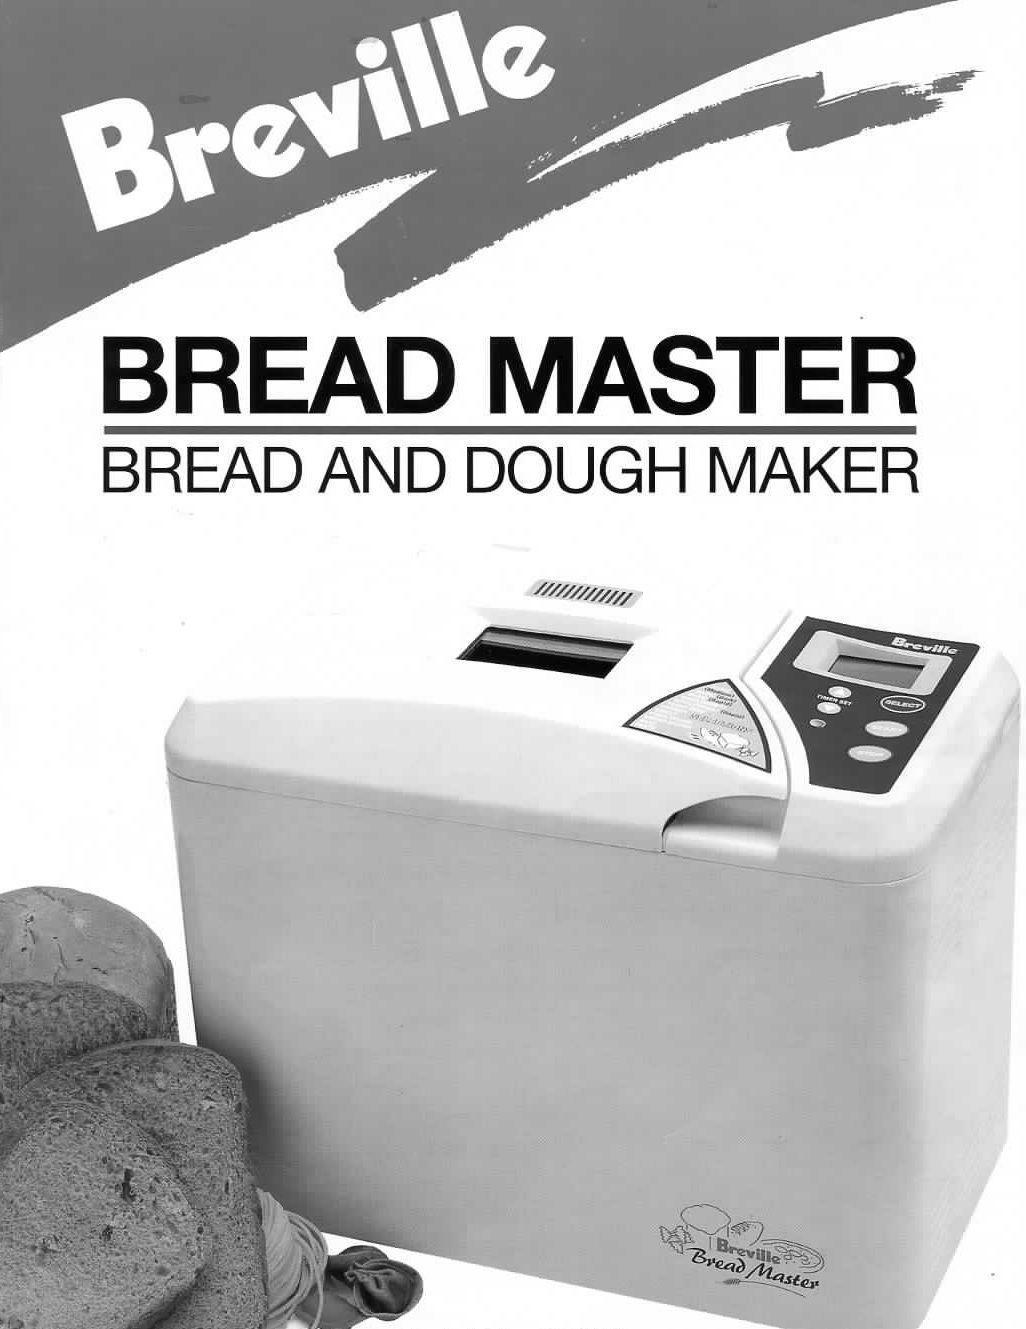 Bread Makers Home Garden Breville Bread Maker Recipes Bread Bread Maker Recipes